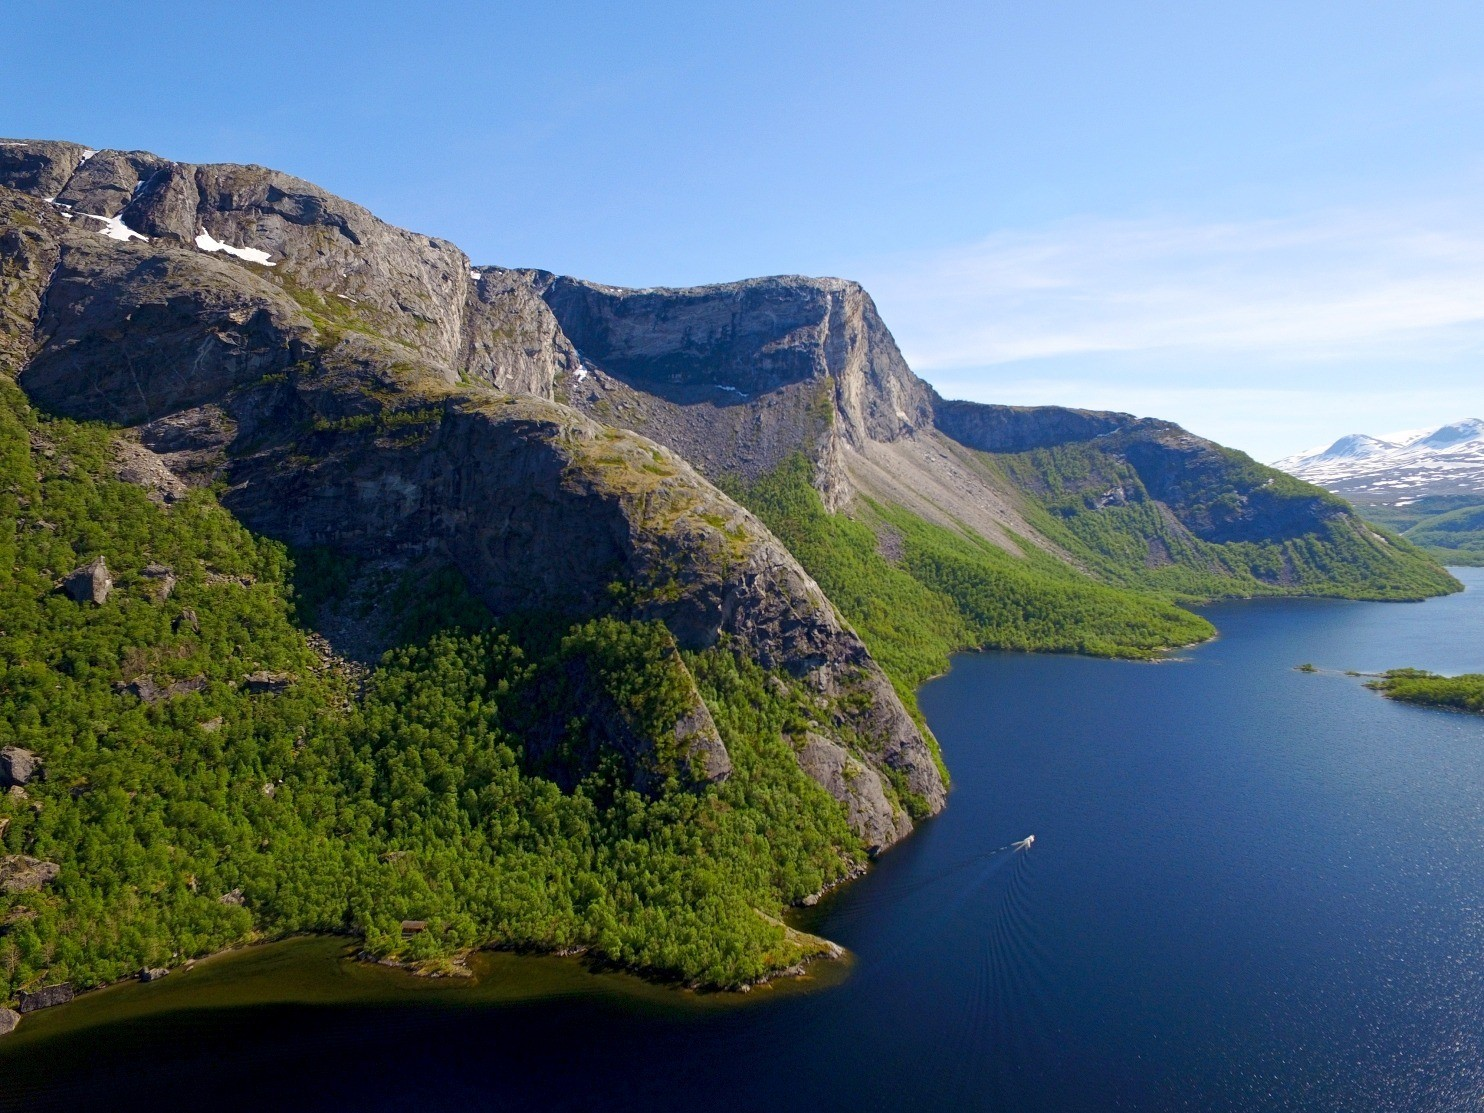 Dronefoto av Børvatnet i Bodø